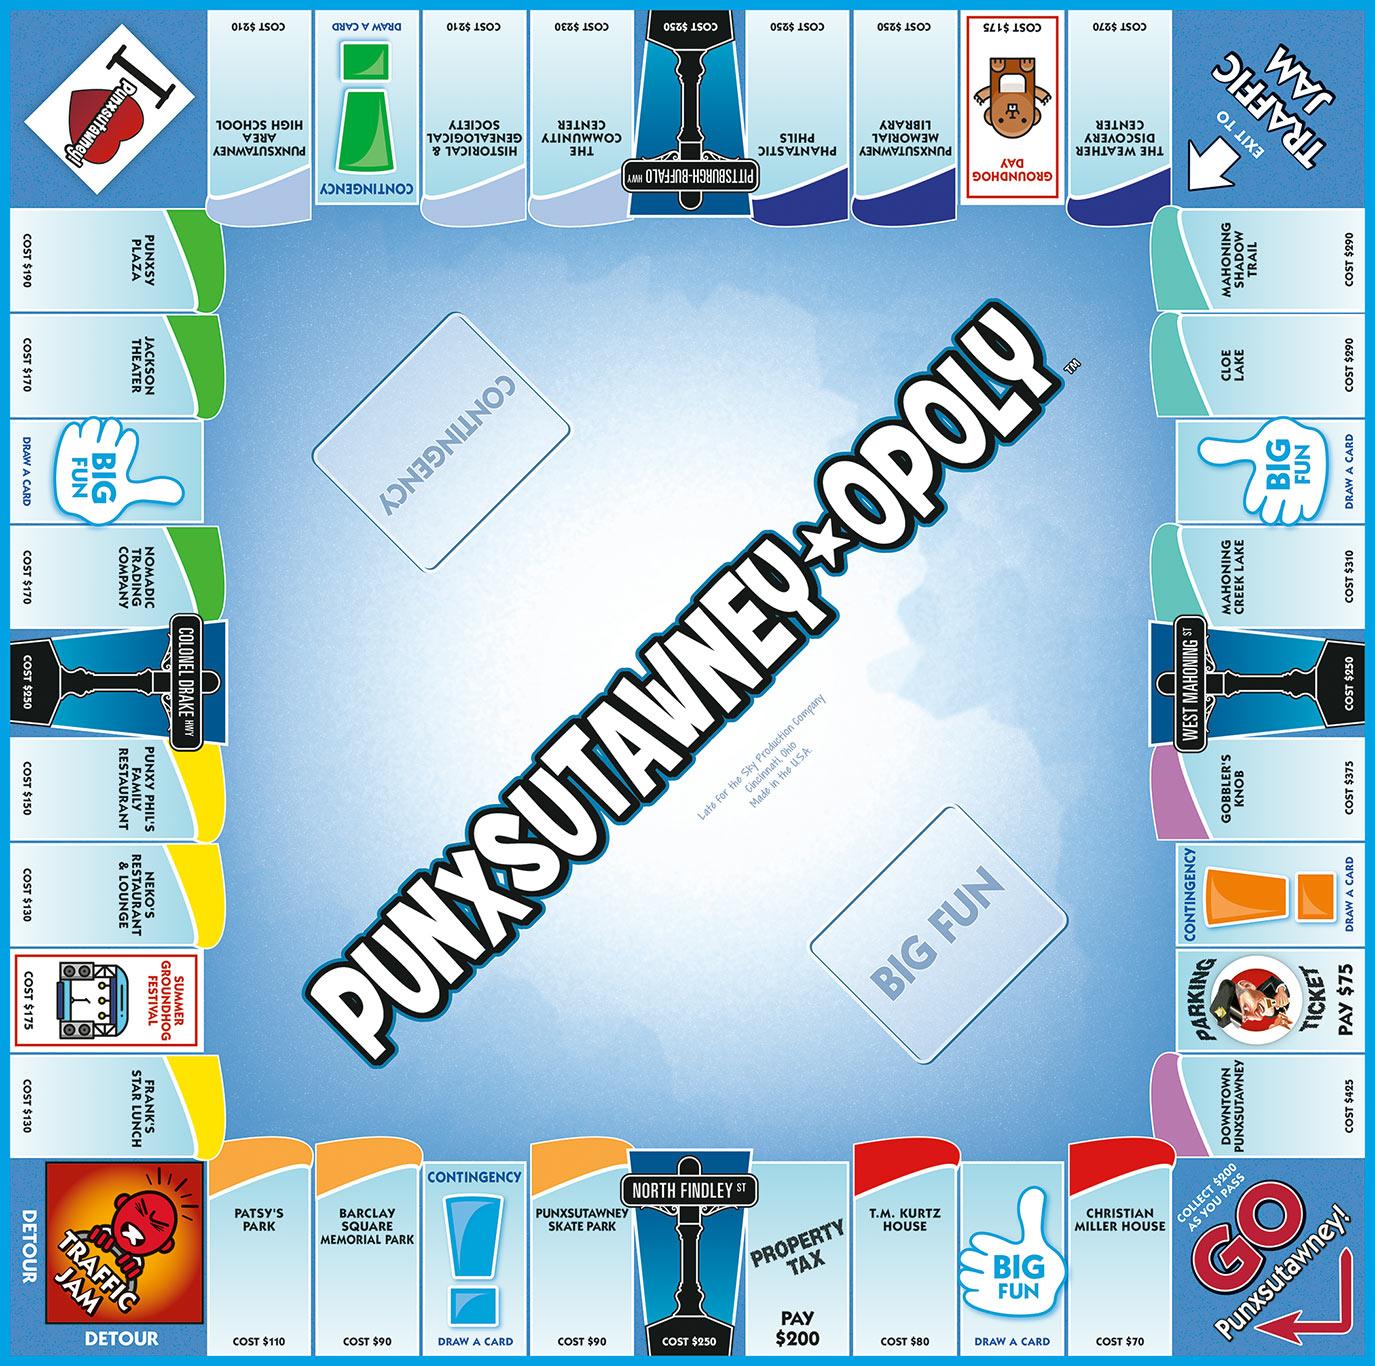 PUNXSUTAWNEY-OPOLY Board Game